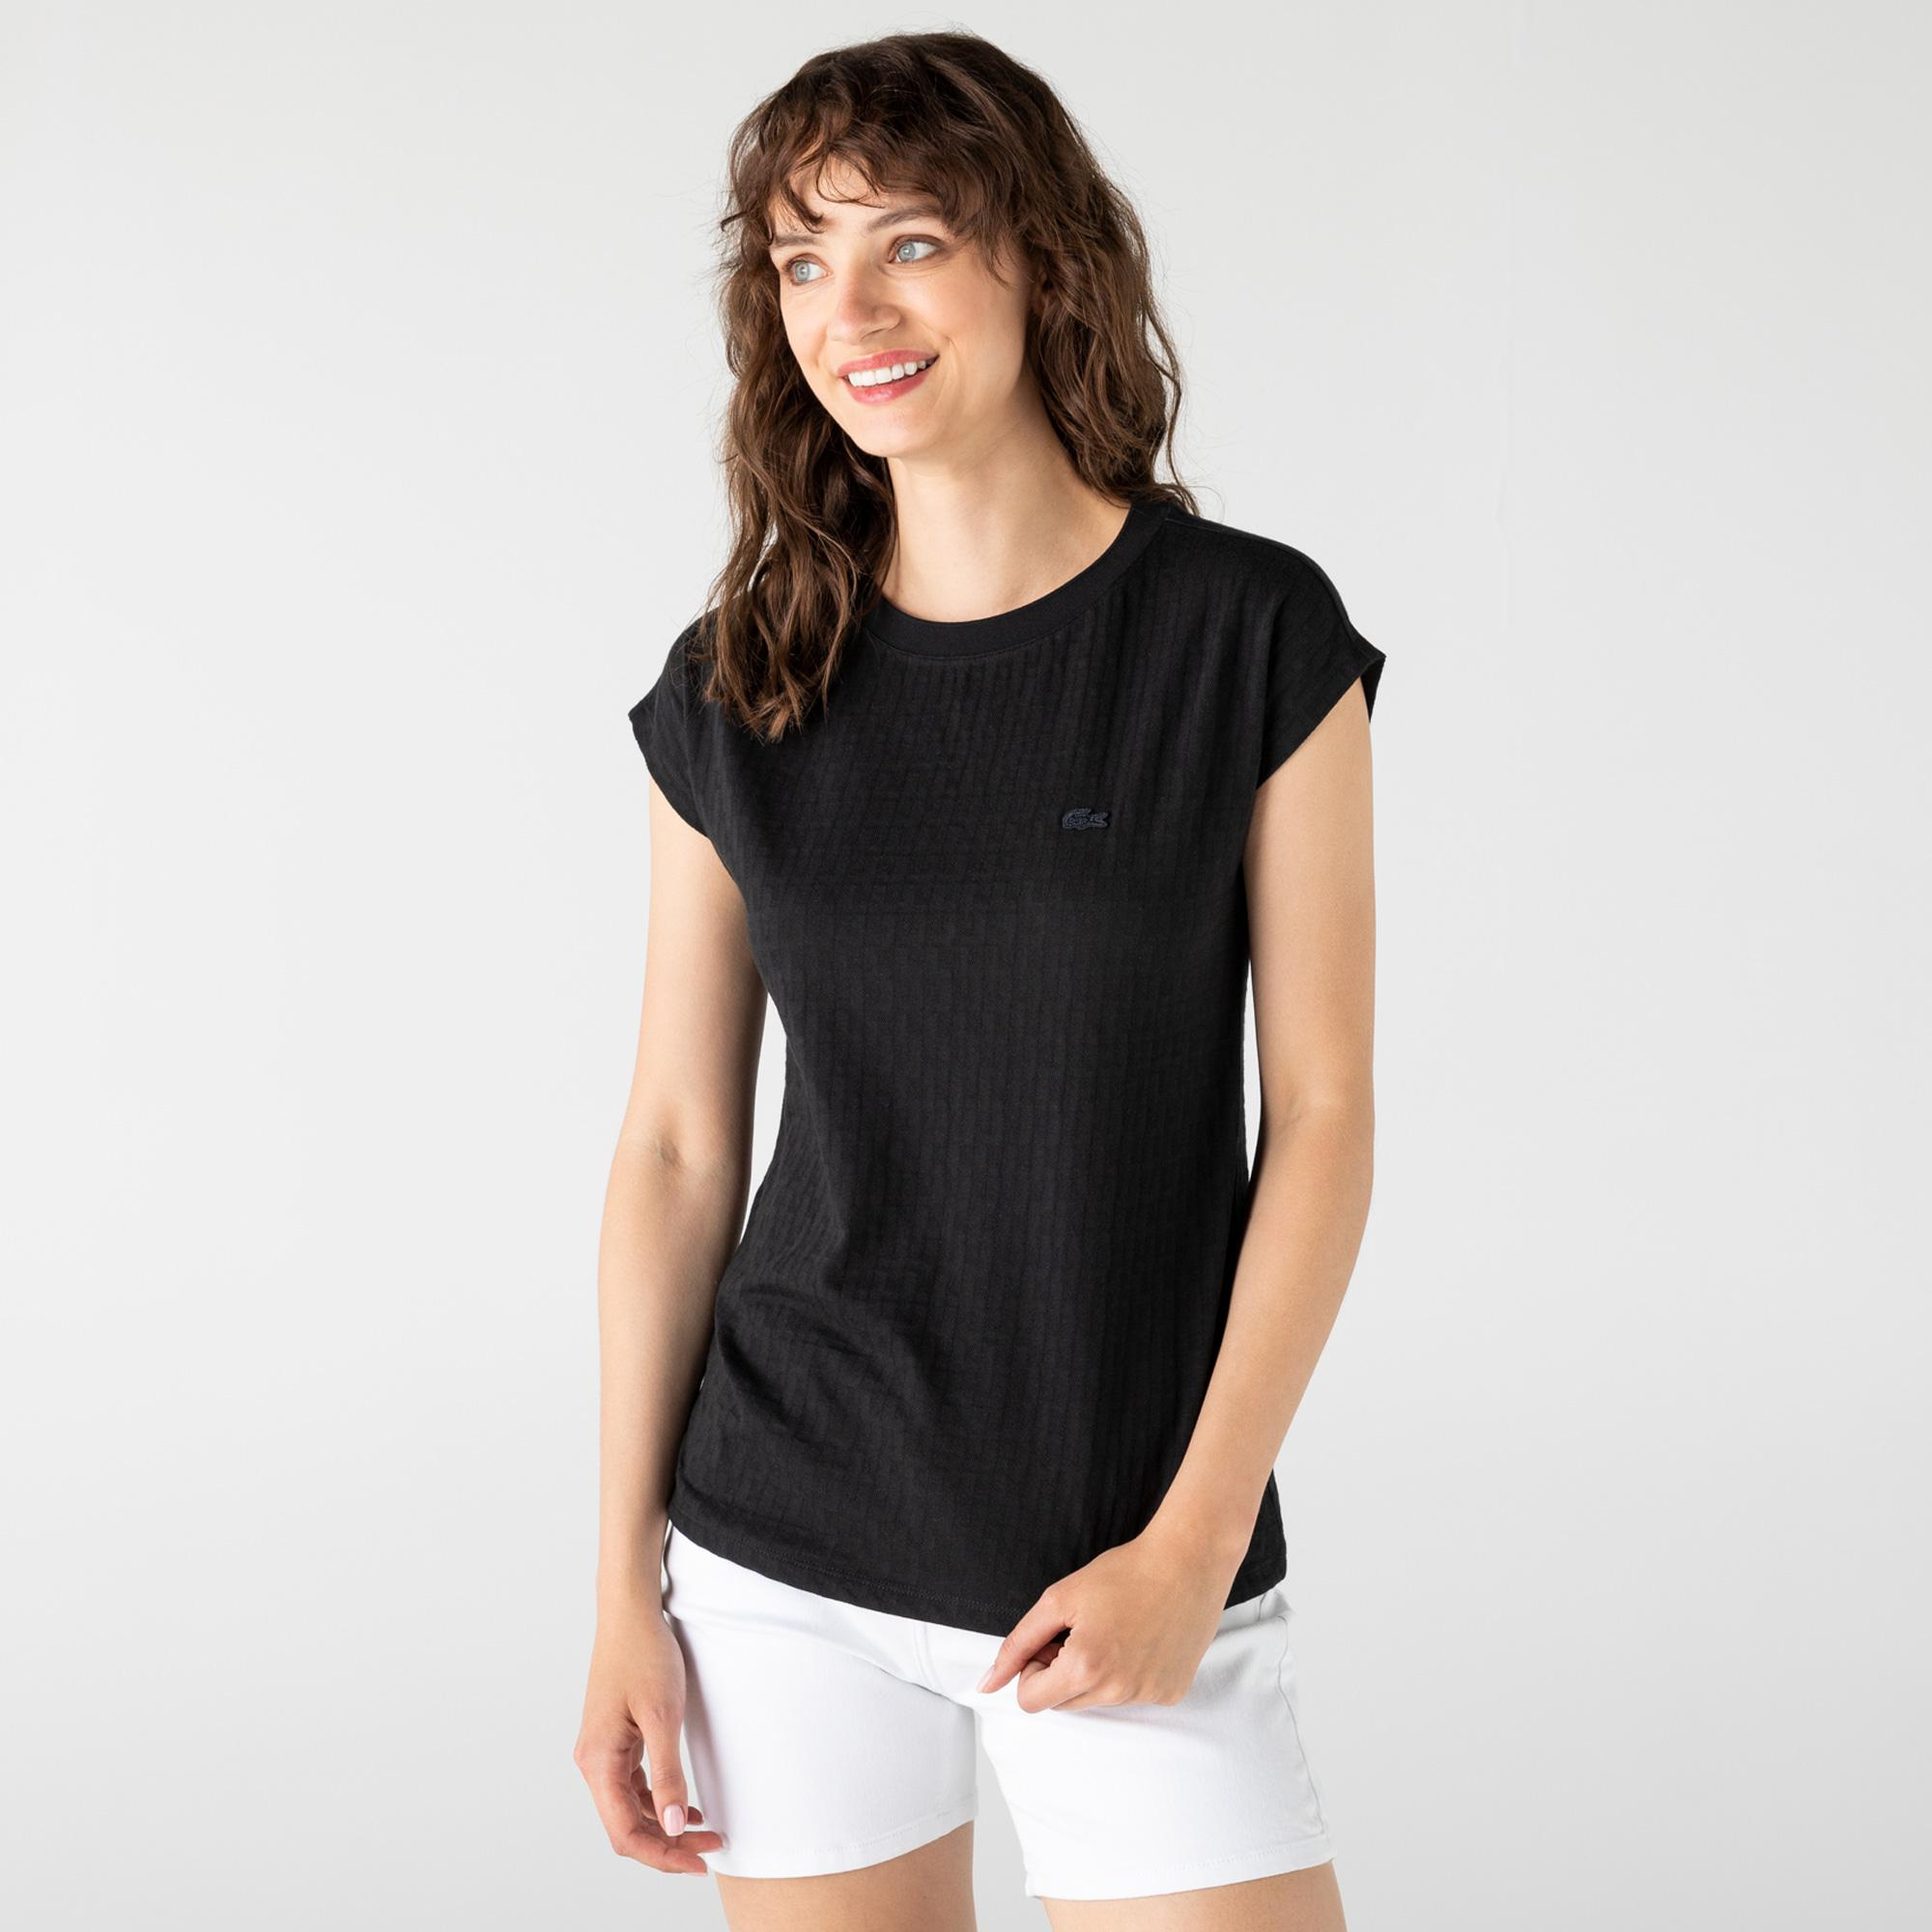 Lacoste Kadın Bisiklet Yaka Desenli Siyah T-Shirt